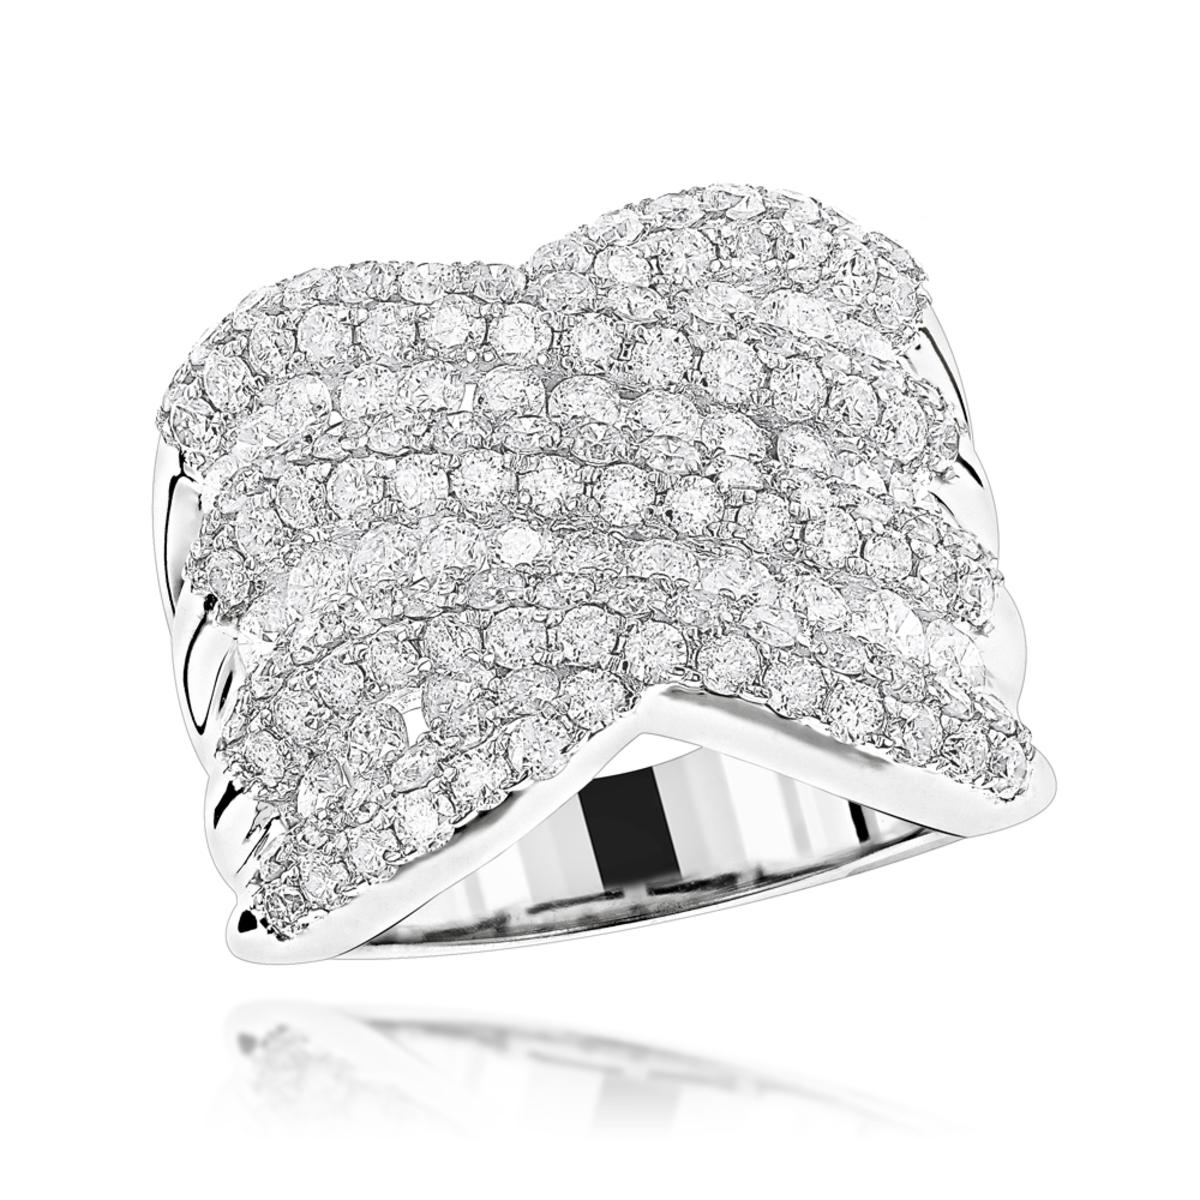 Luxurman Statement Jewelry Platinum Ladies Diamond Cocktail Ring 4ct G/VS